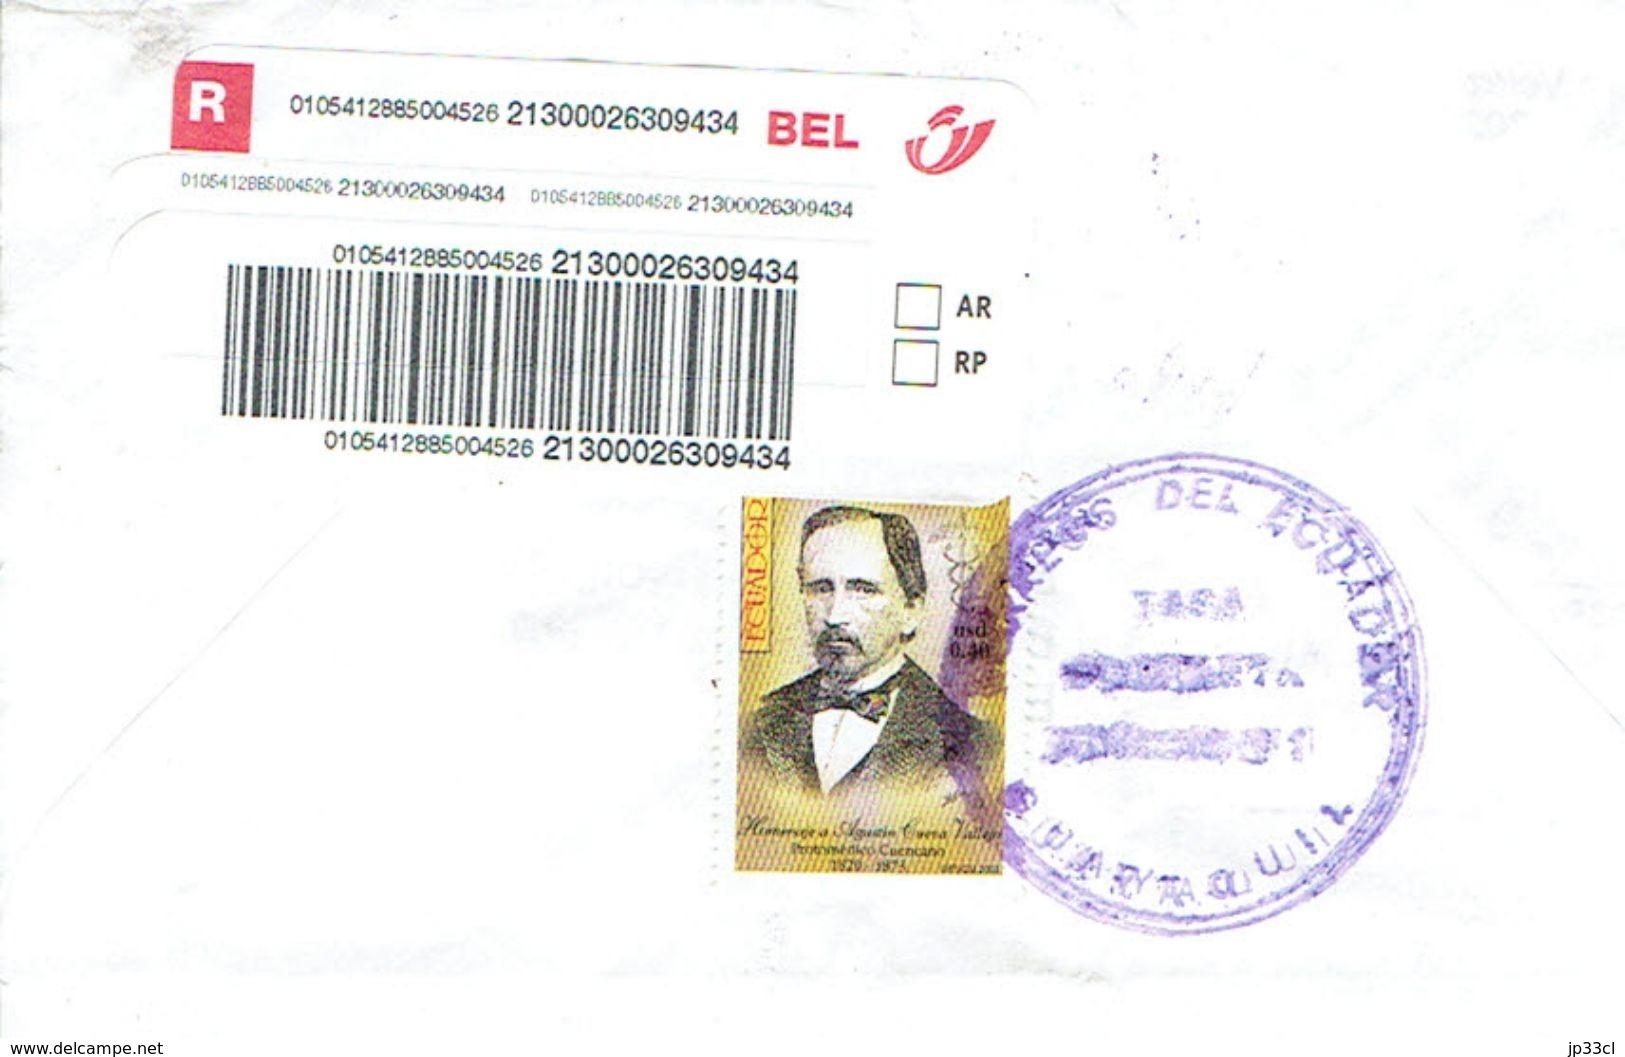 Lettre Recommandée De Guayaquil, Equateur (Ecuador) Avec 5 Timbres Augustin Cueva Vallejo Vers La Belgique (2003) - Equateur